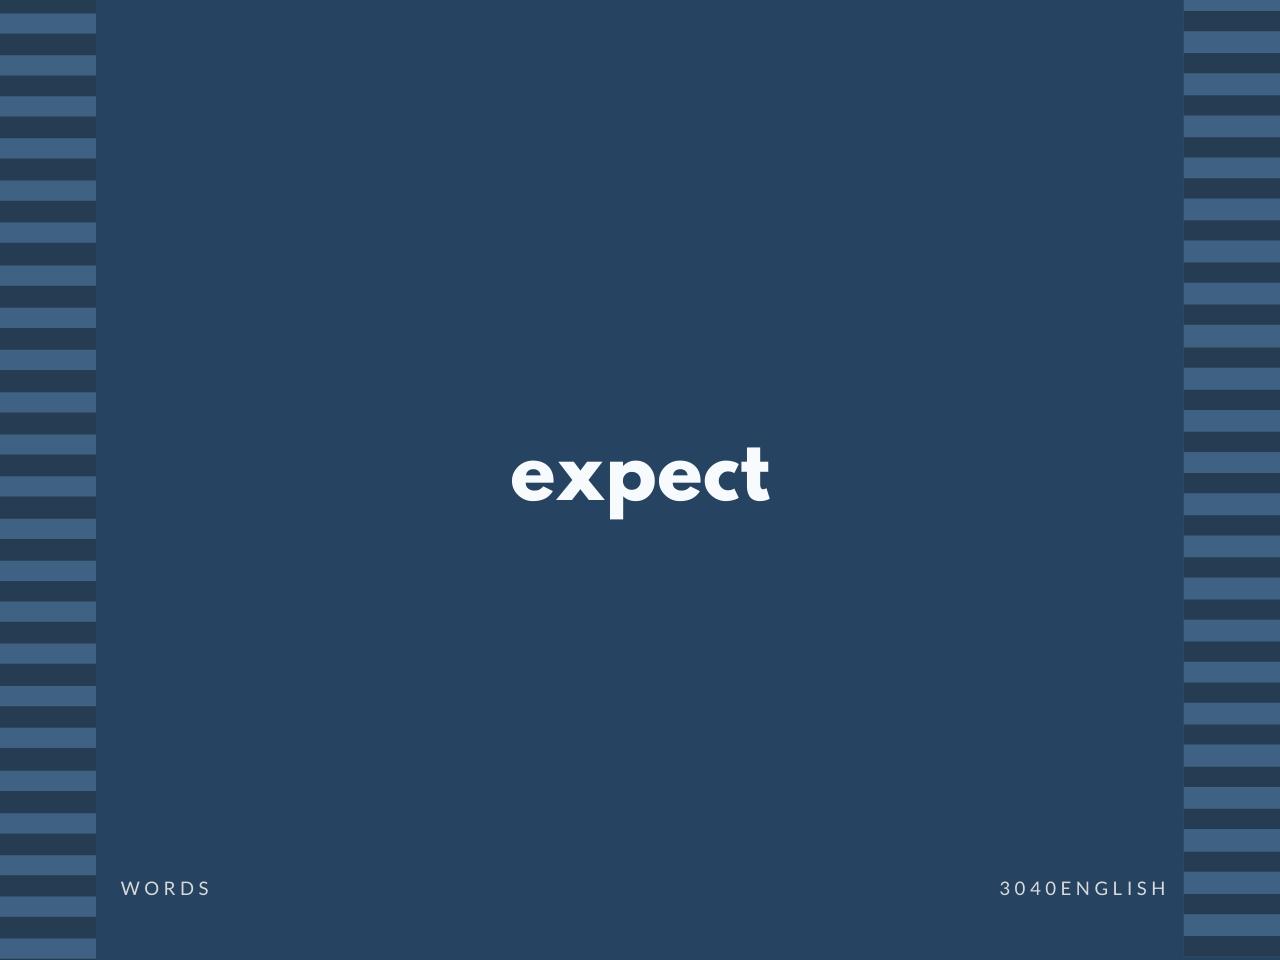 expect の意味と簡単な使い方【音読用例文あり】